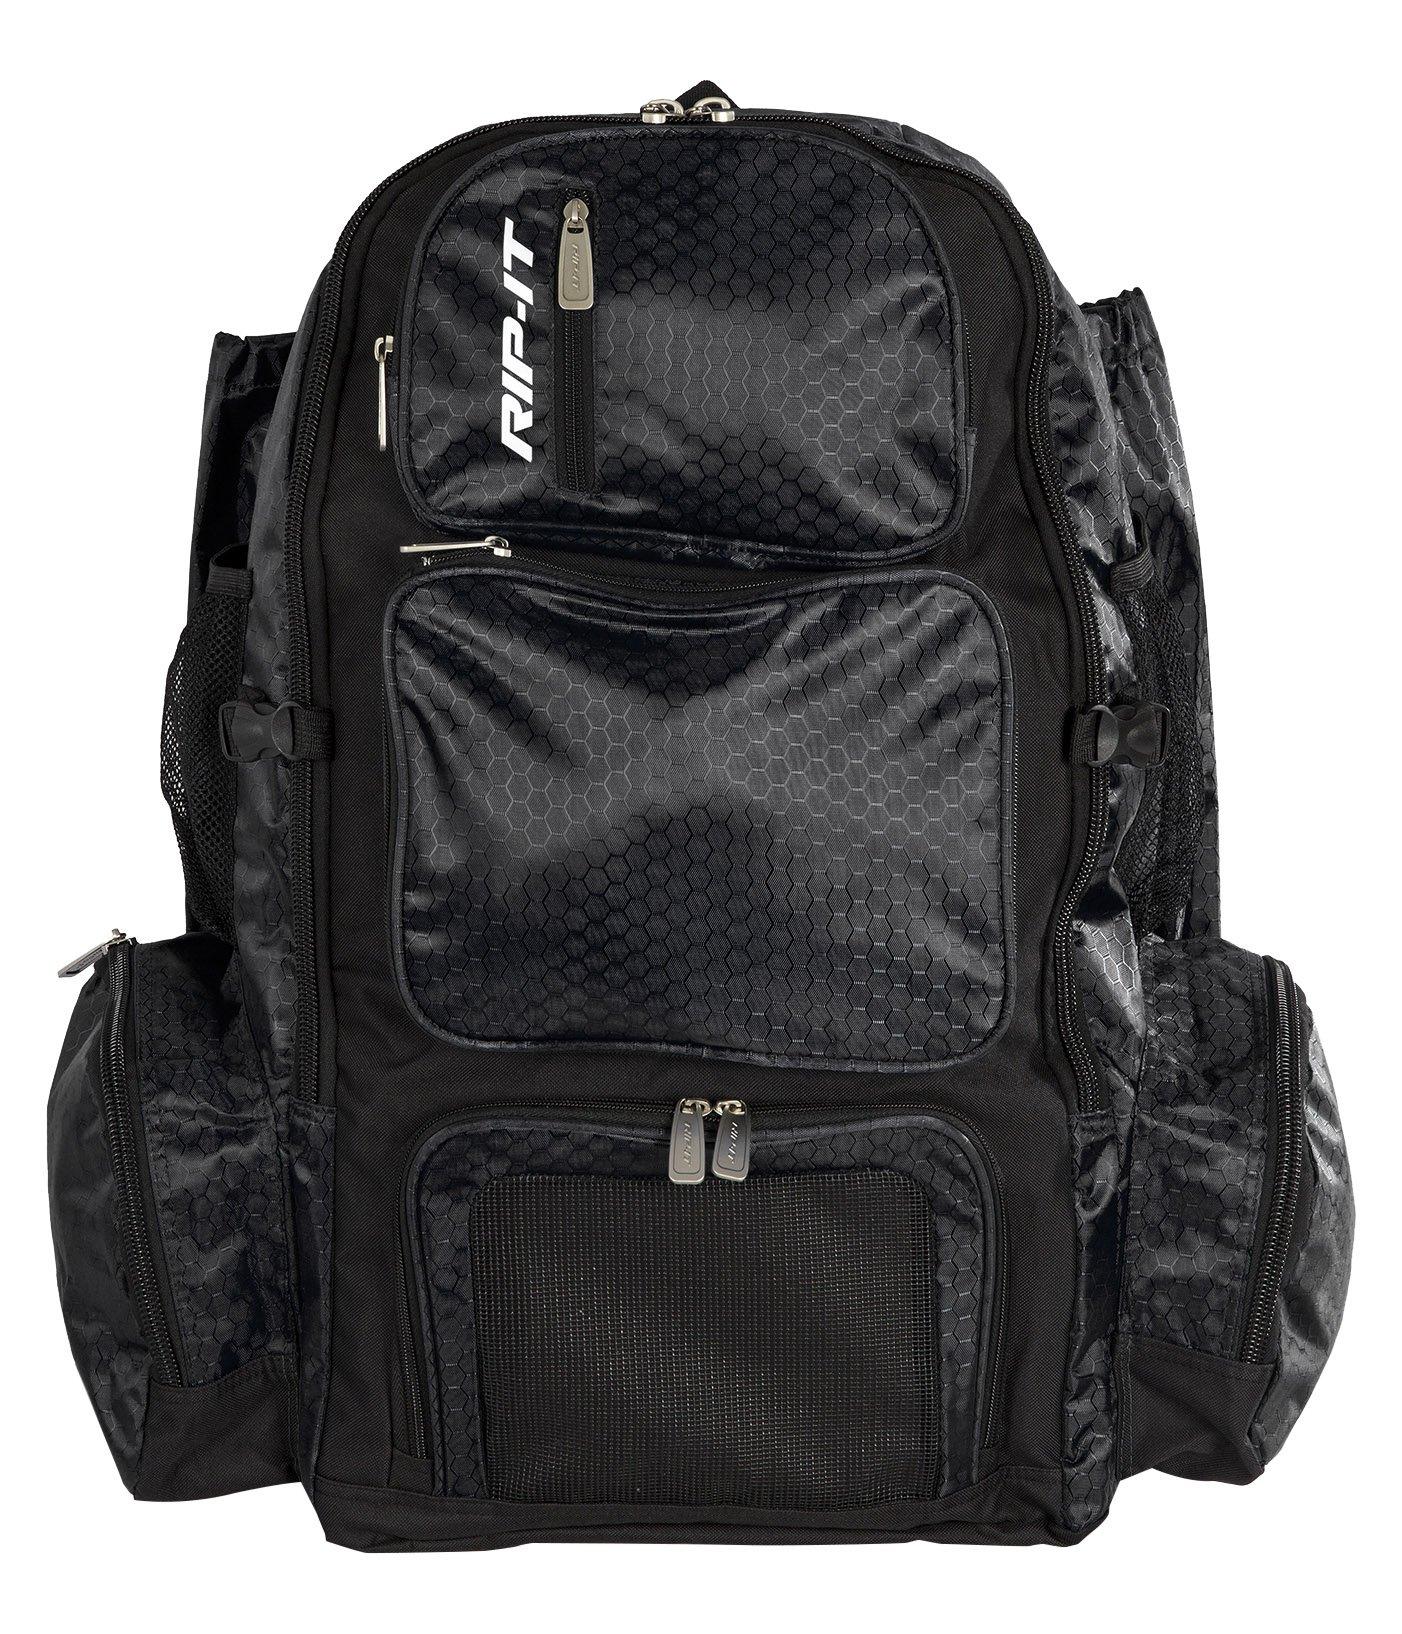 RIP-IT Pack It Up Backpack - Softball Equipment Bag - Black